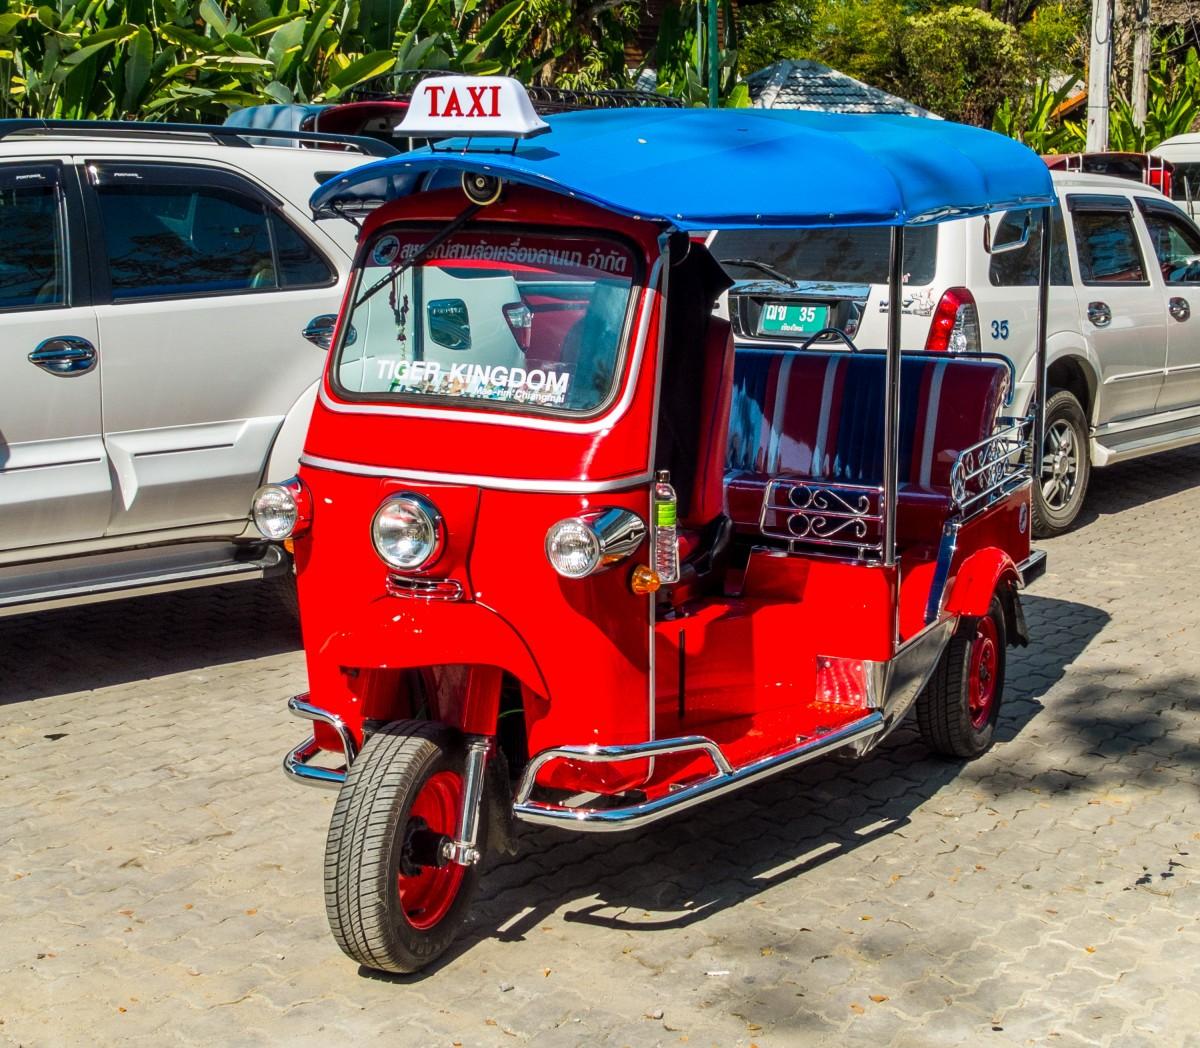 tuk_tuk_taxi_thailand